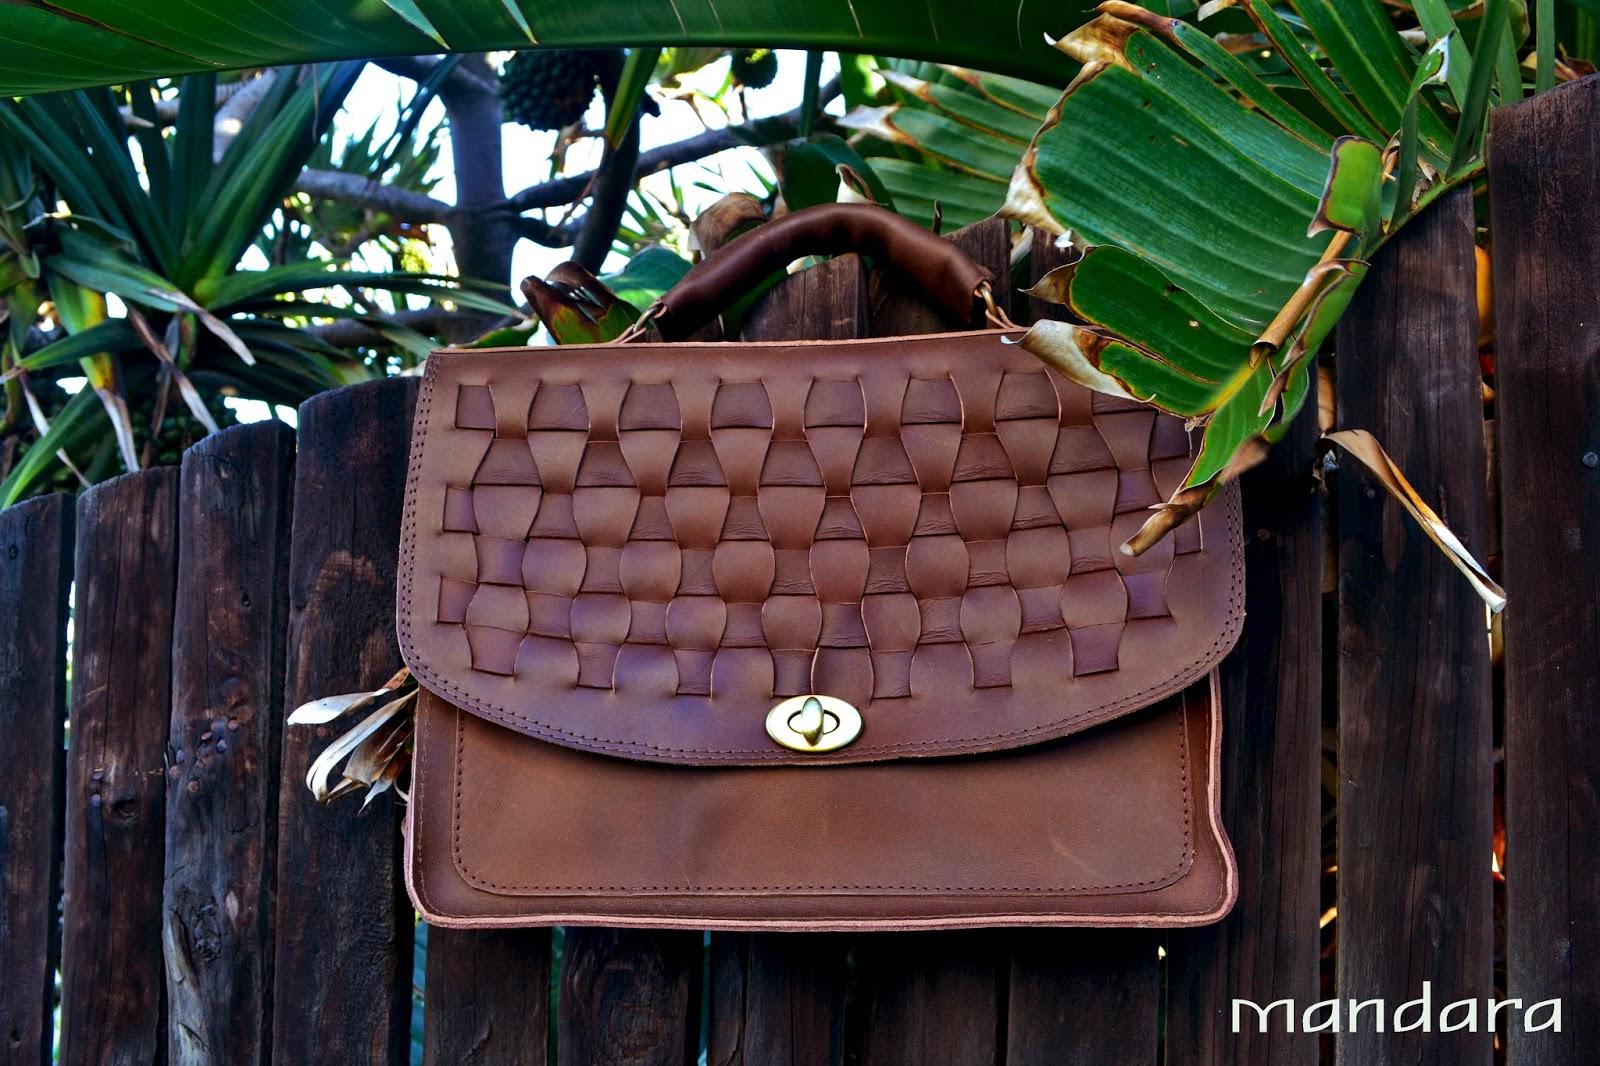 a297b9fddf15 Handmade leather briefcase